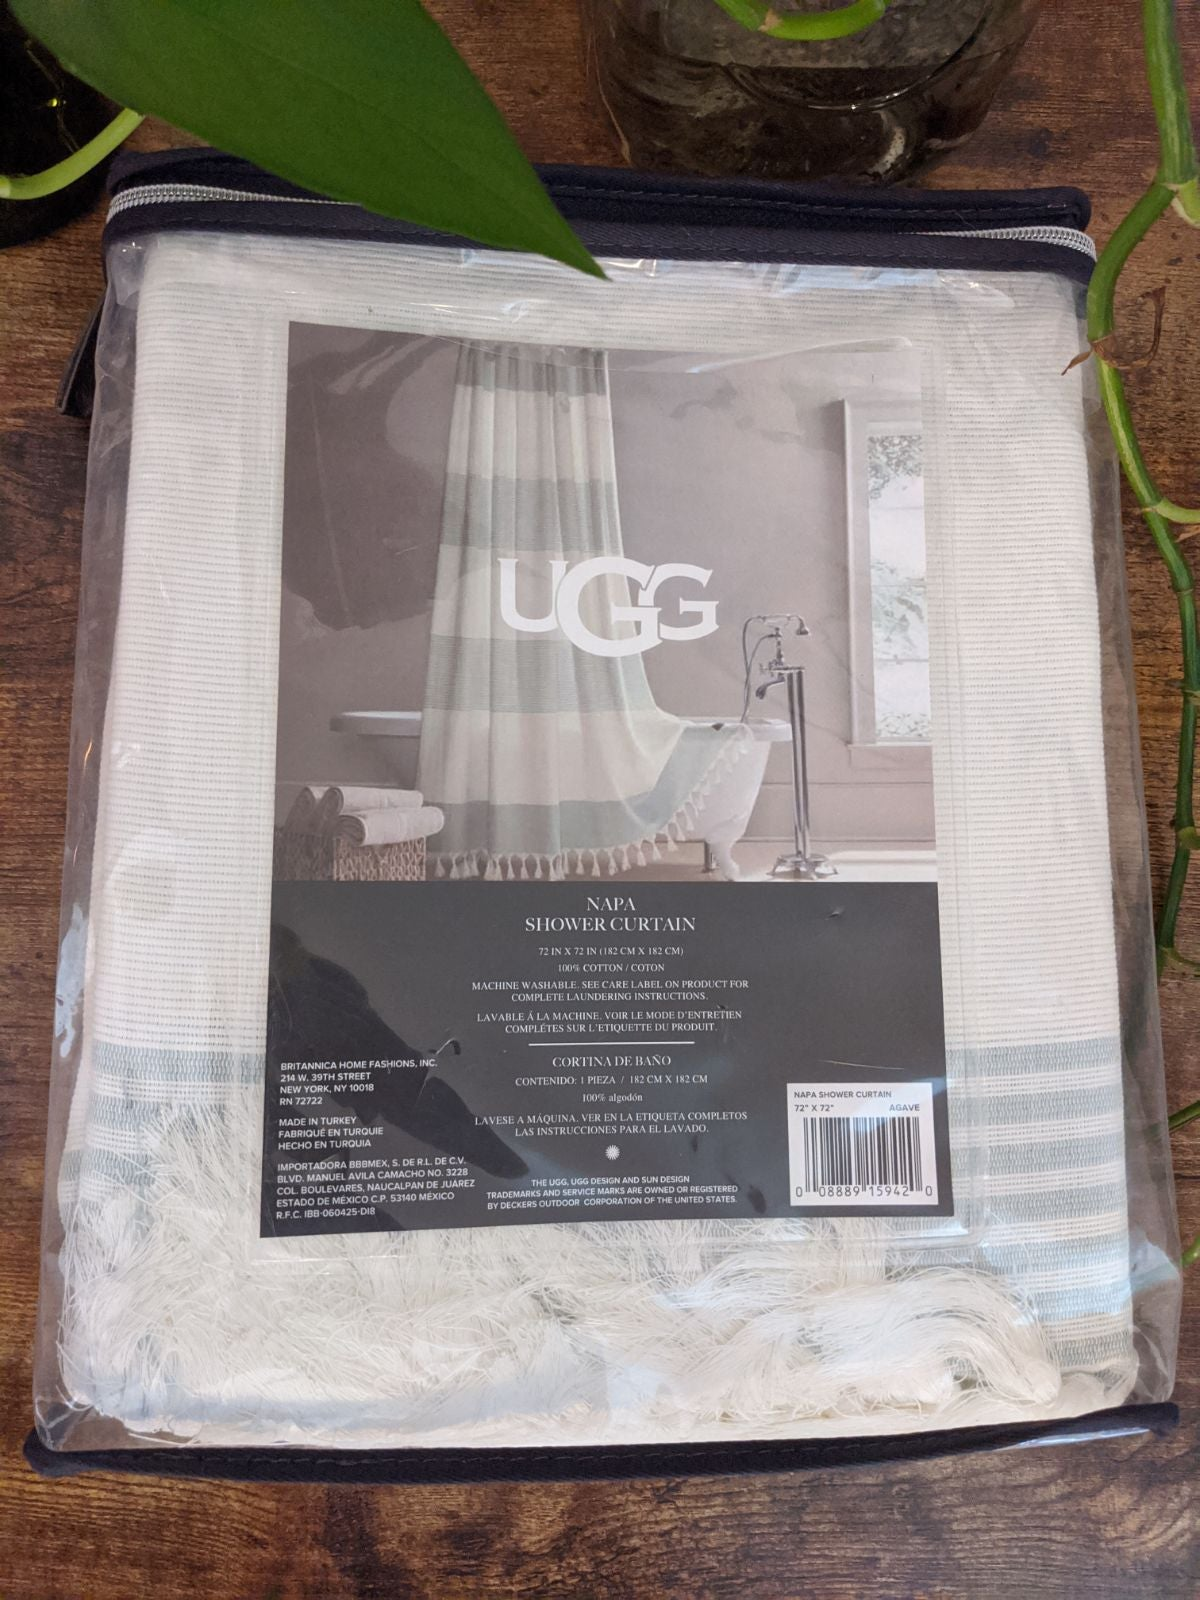 Ugg Napa Shower Curtain